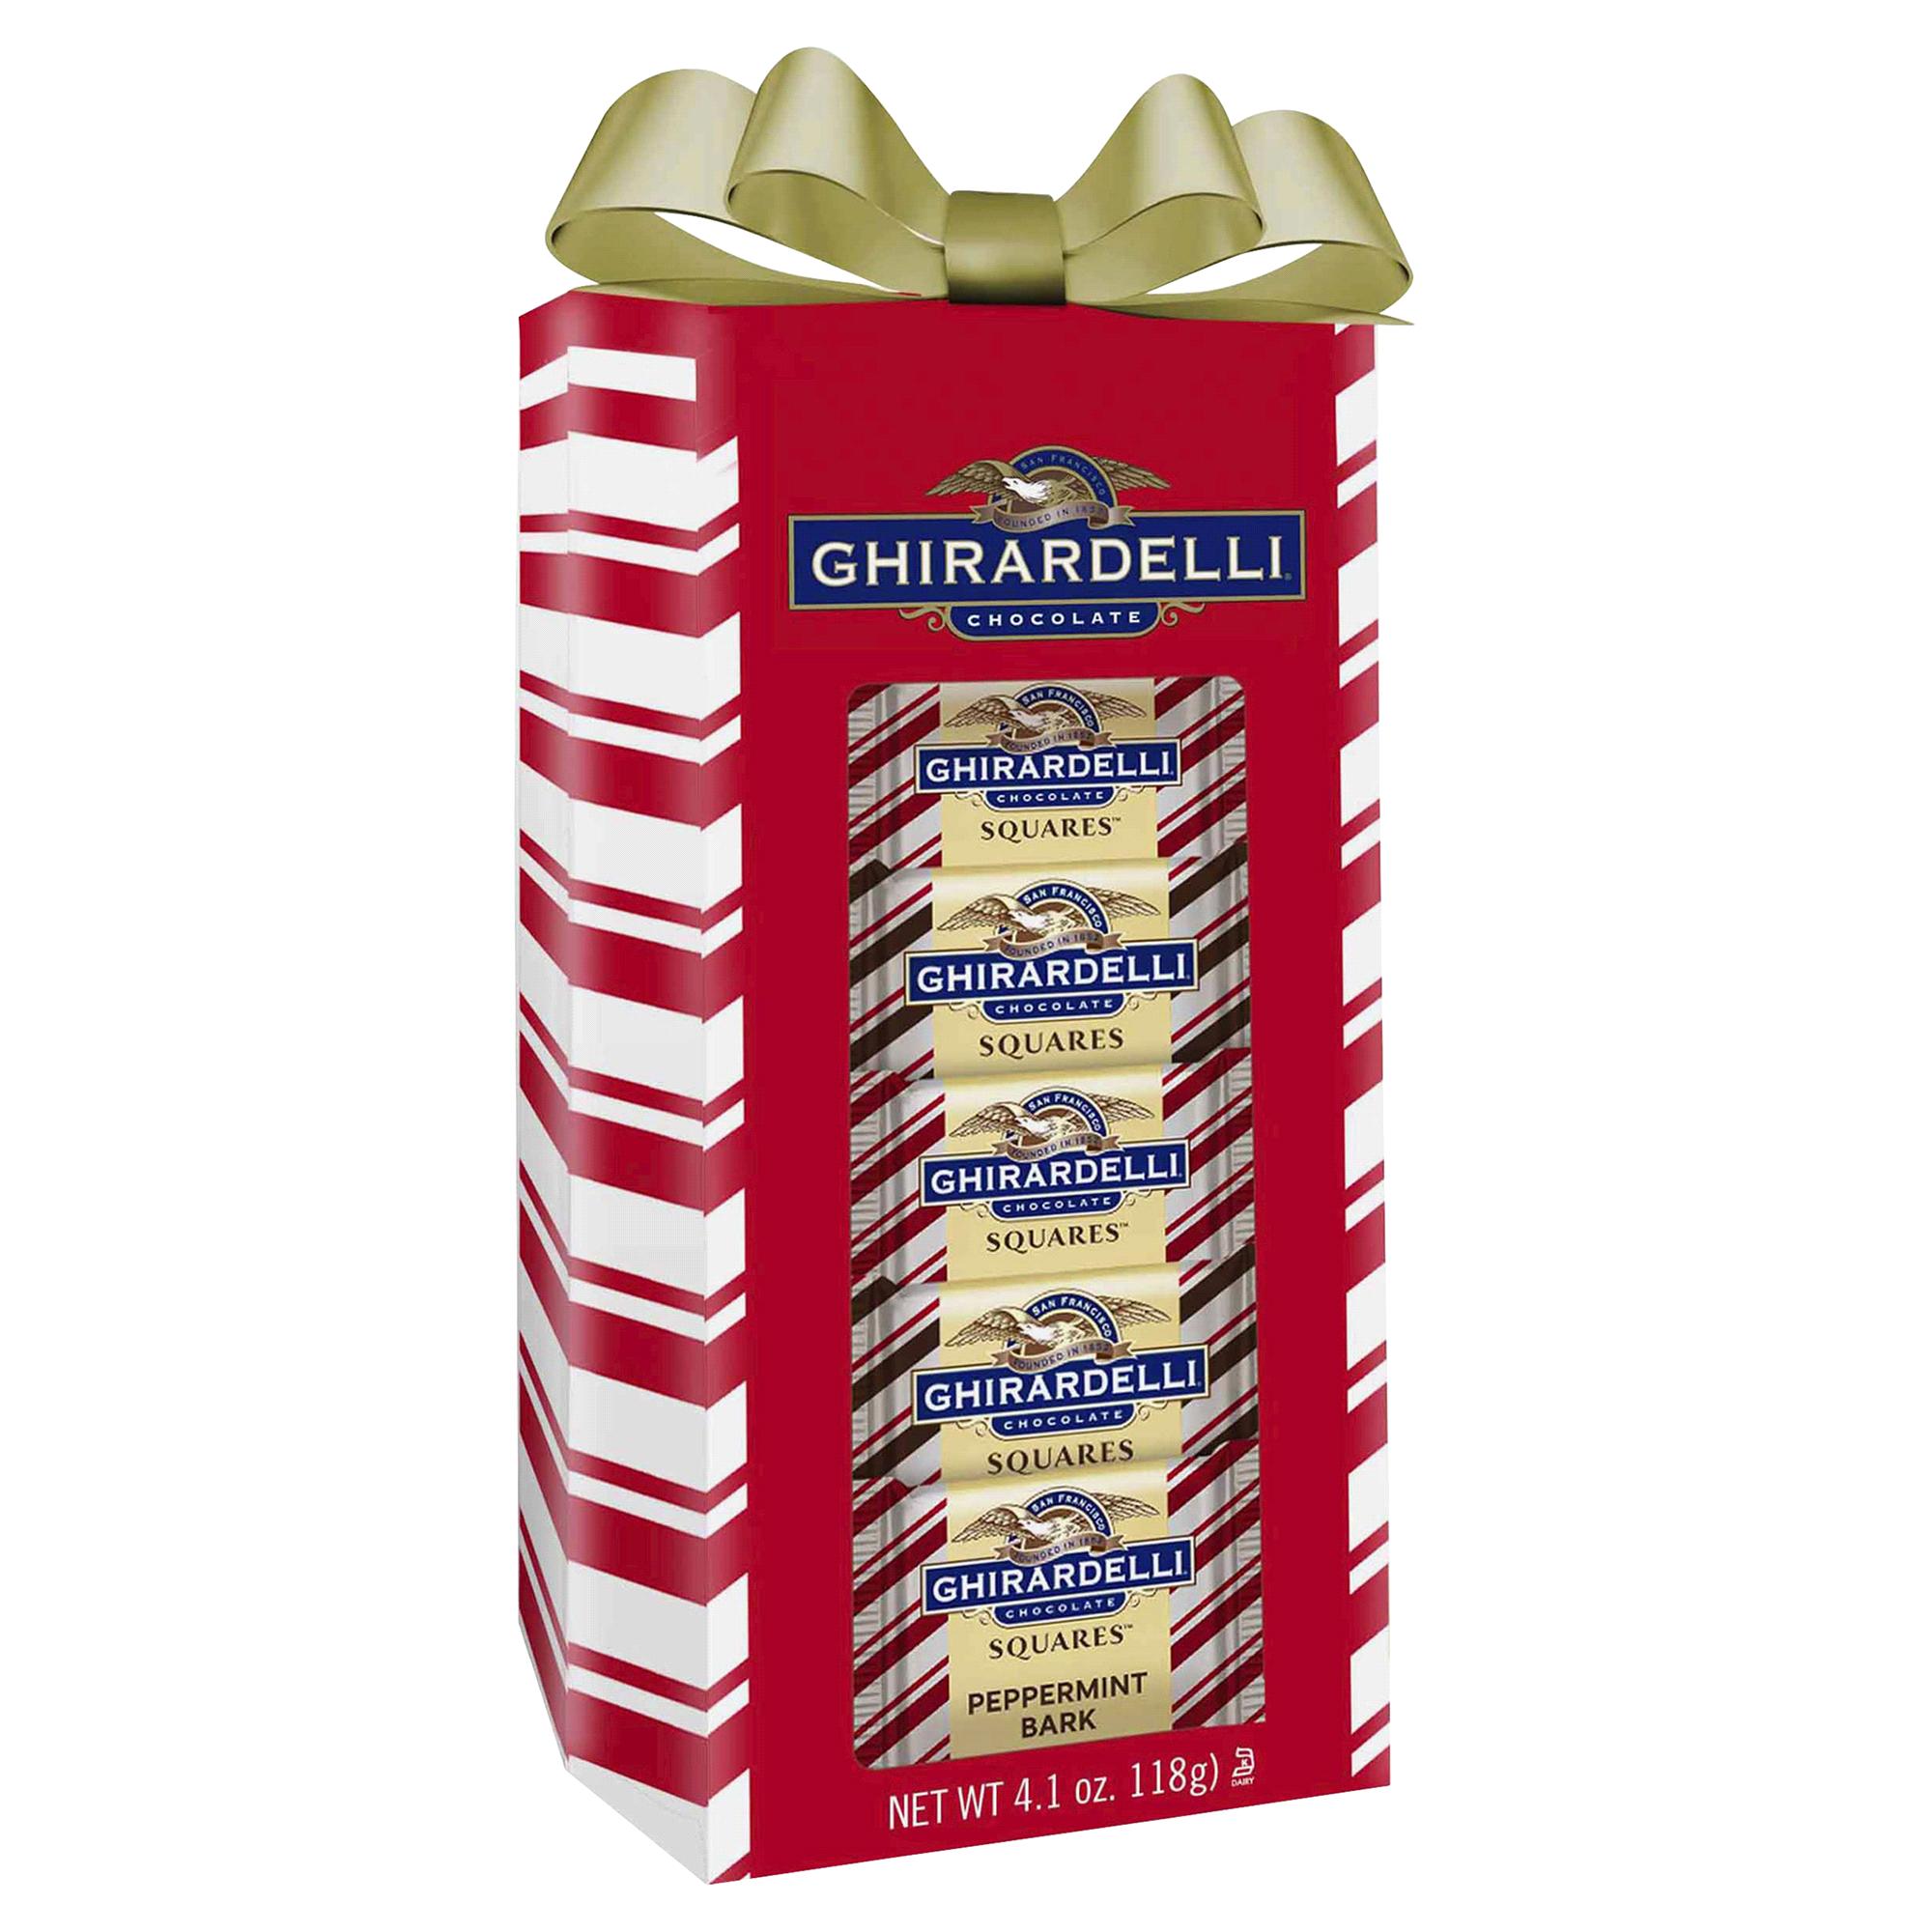 Ghirardelli Holiday Peppermint Bark Window Gift 41 oz  Meijercom